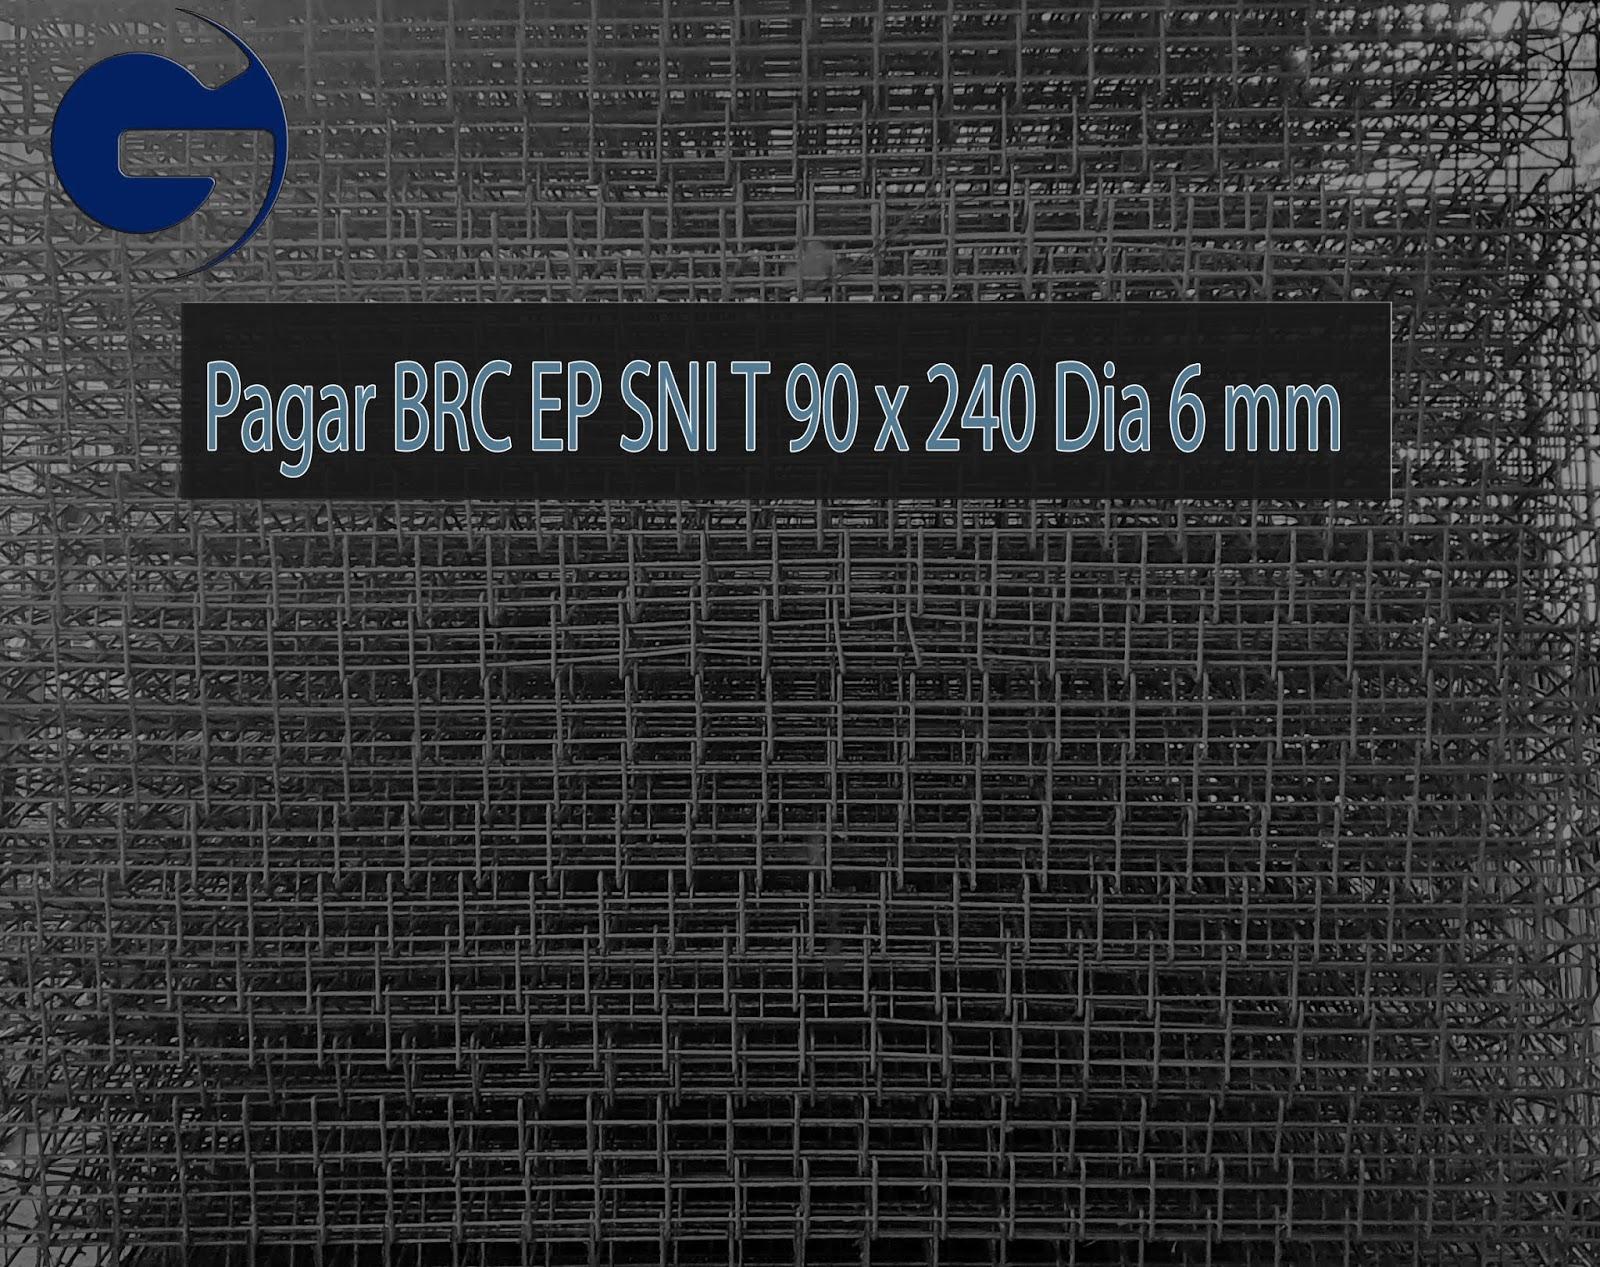 Jual Pagar BRC EP SNI T 90 x 240 Dia 6 mm